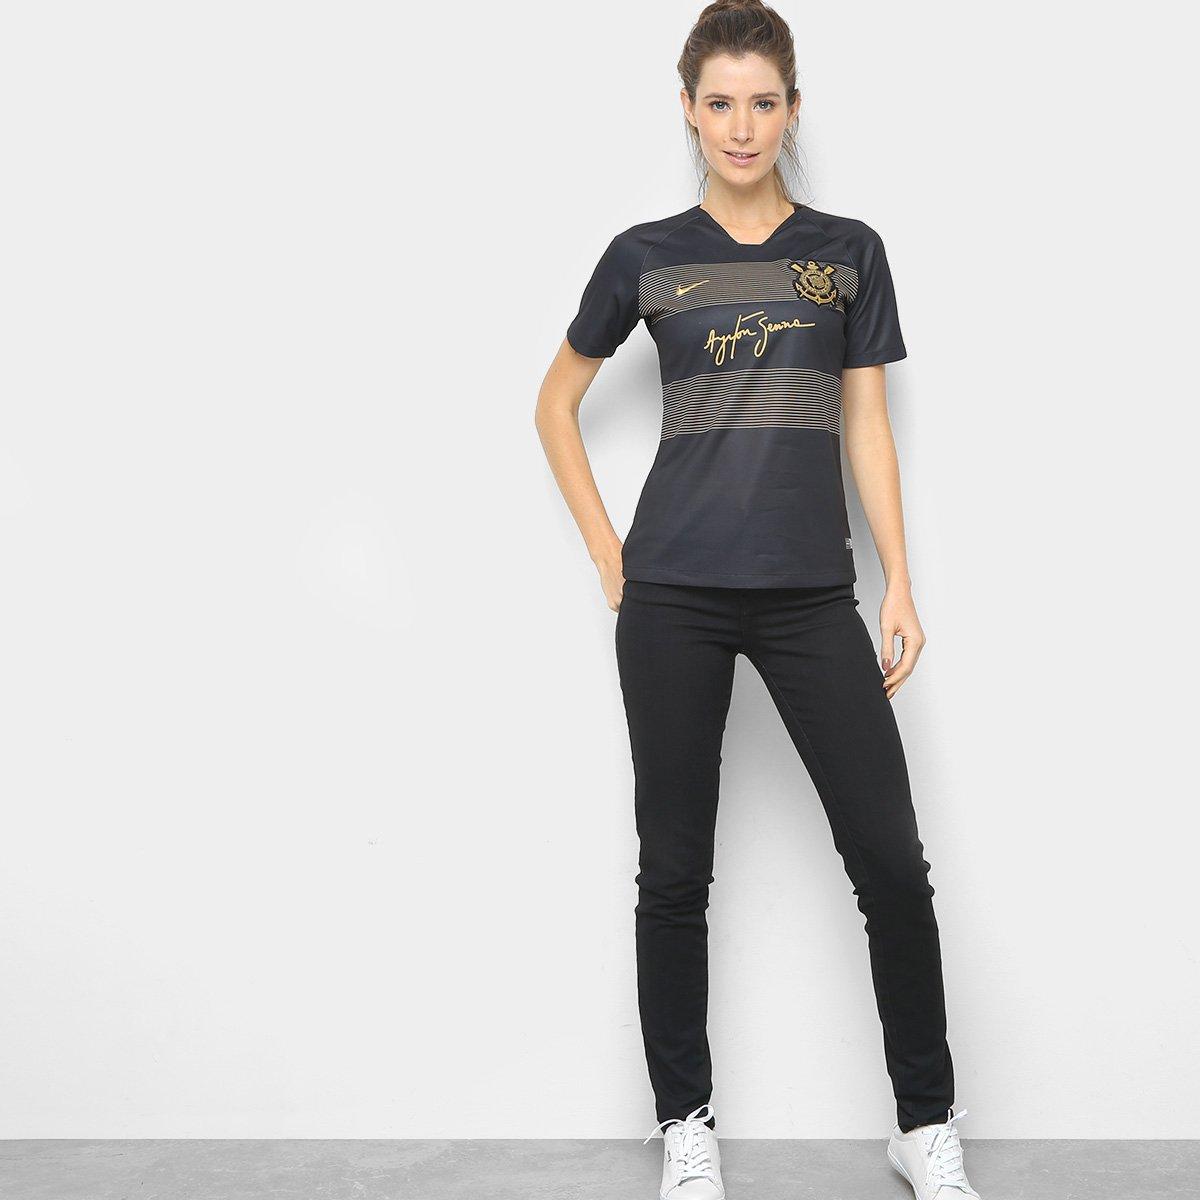 Camisa Corinthians III 2018 s n° - Torcedor Nike Feminina - Preto e ... 2f9486627ad59